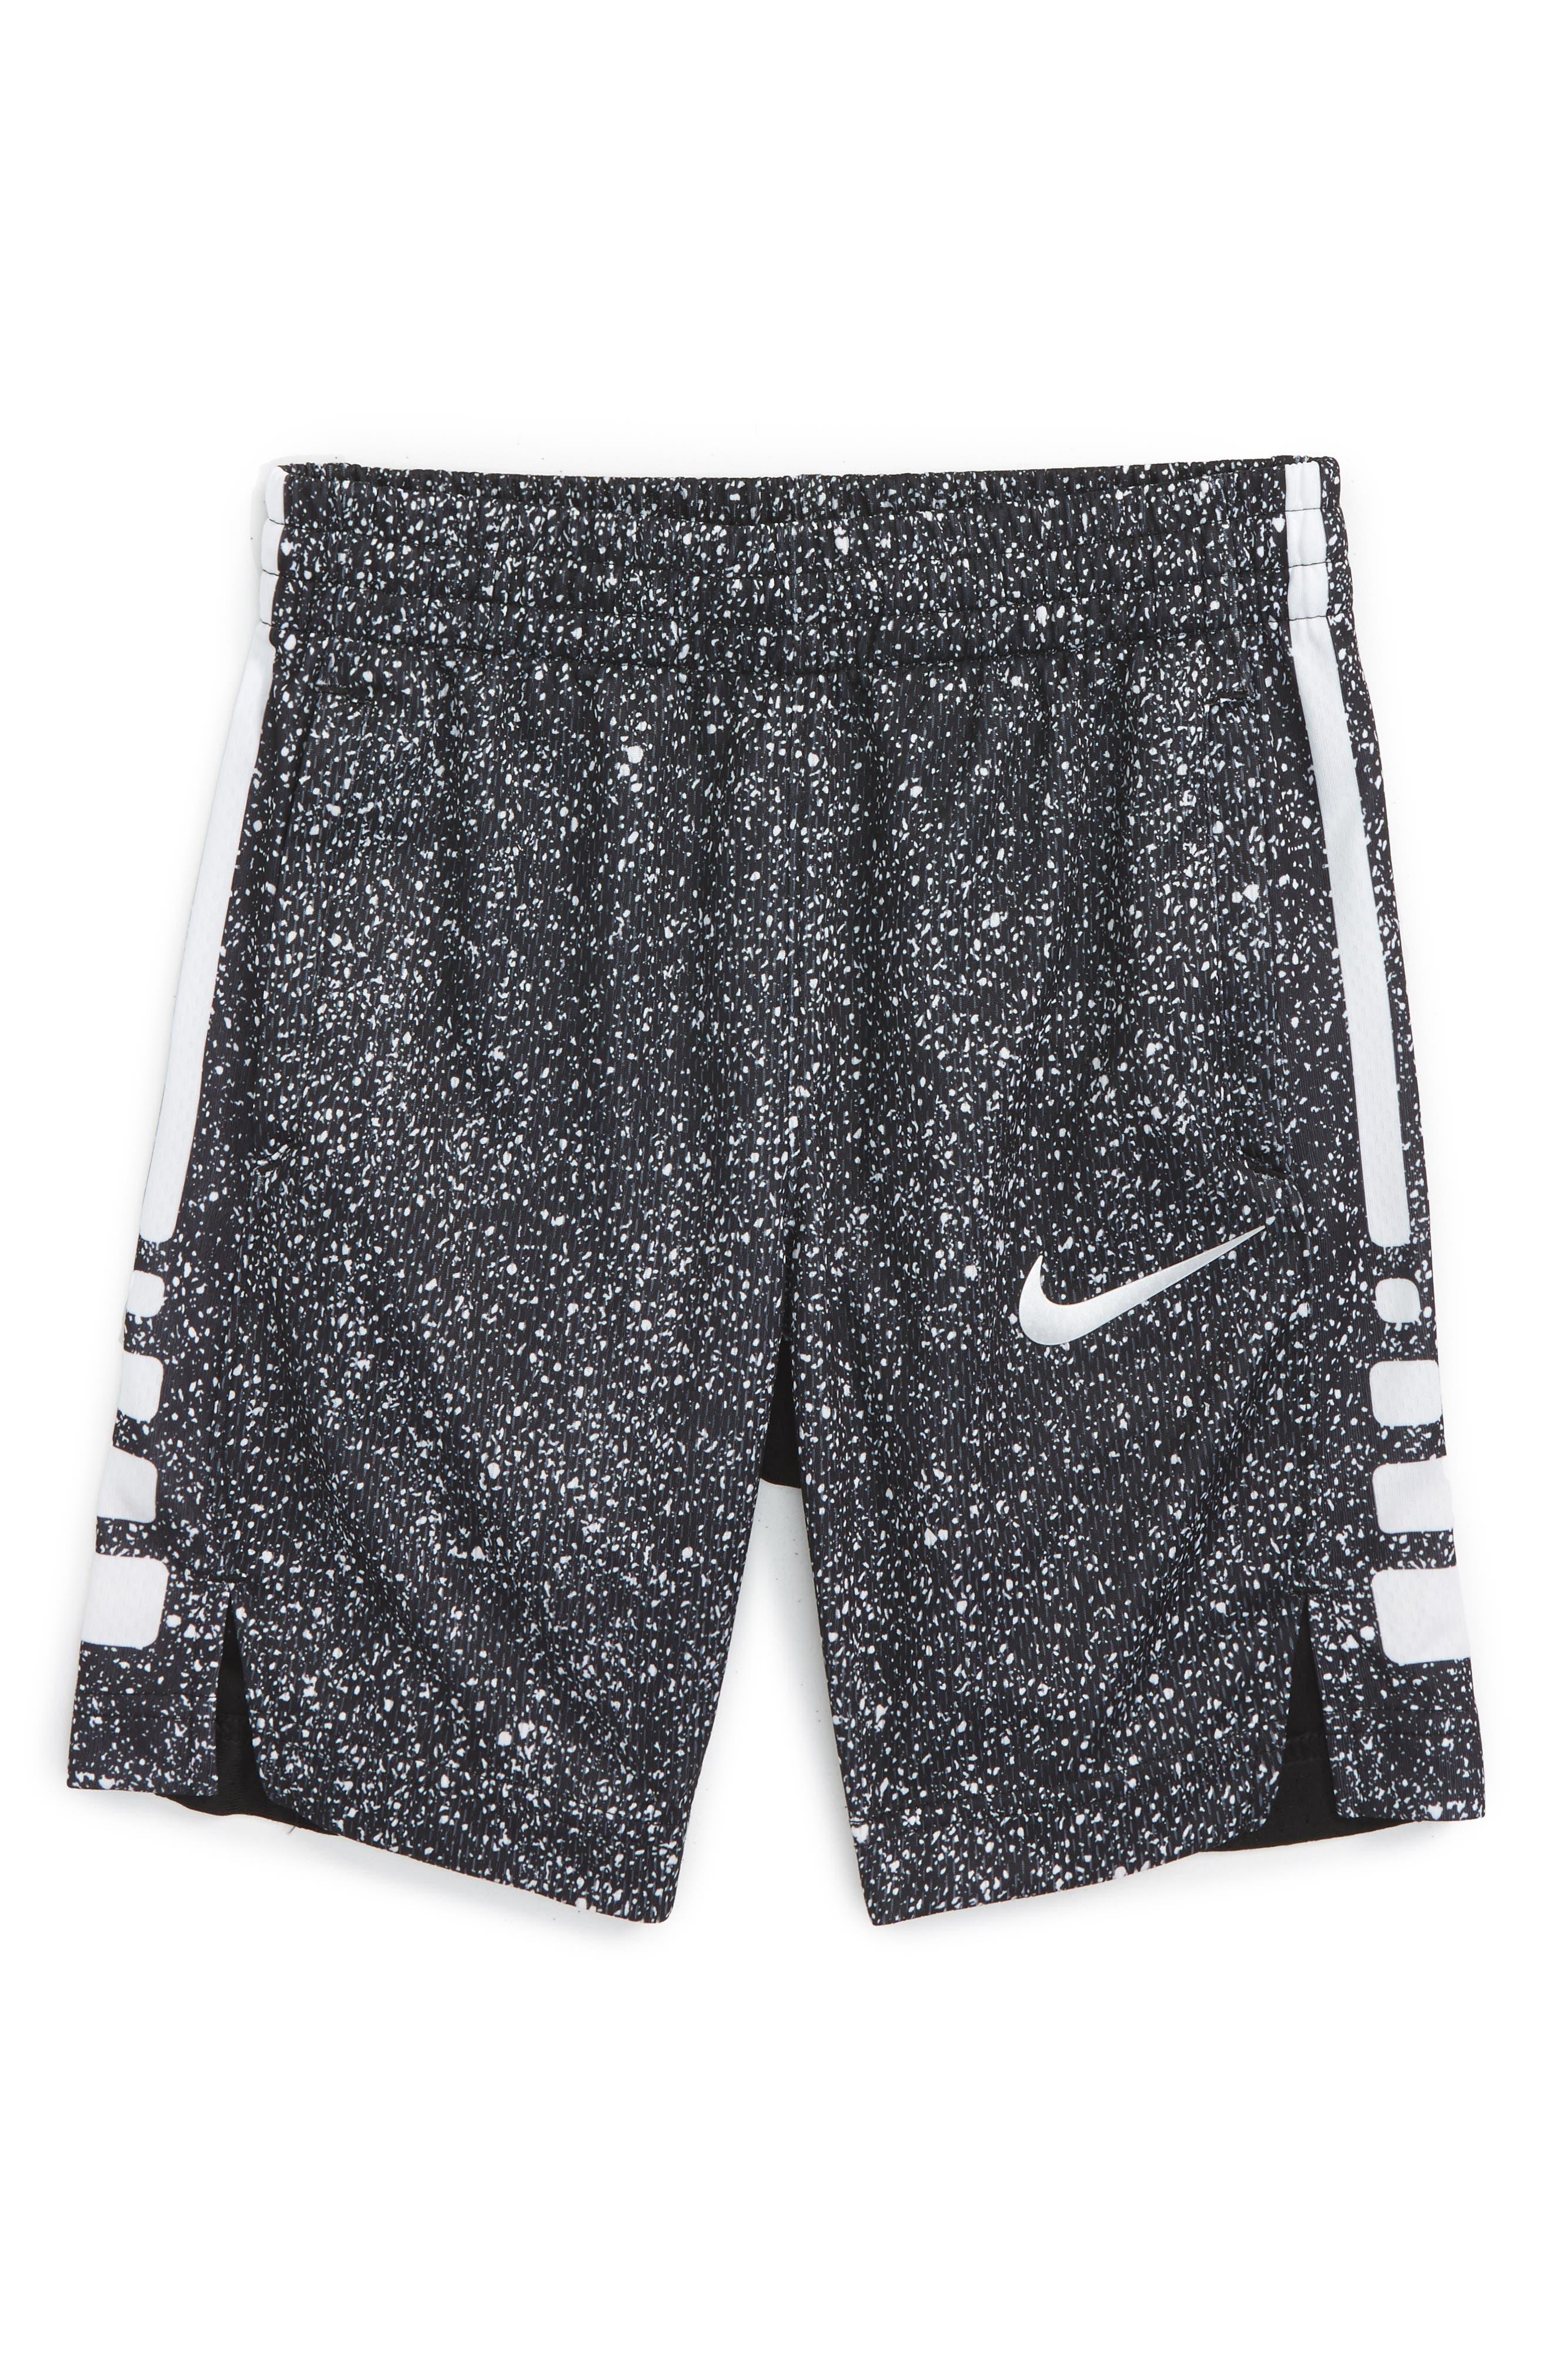 Main Image - Nike Elite Print Shorts (Toddler Boys & Little Boys)